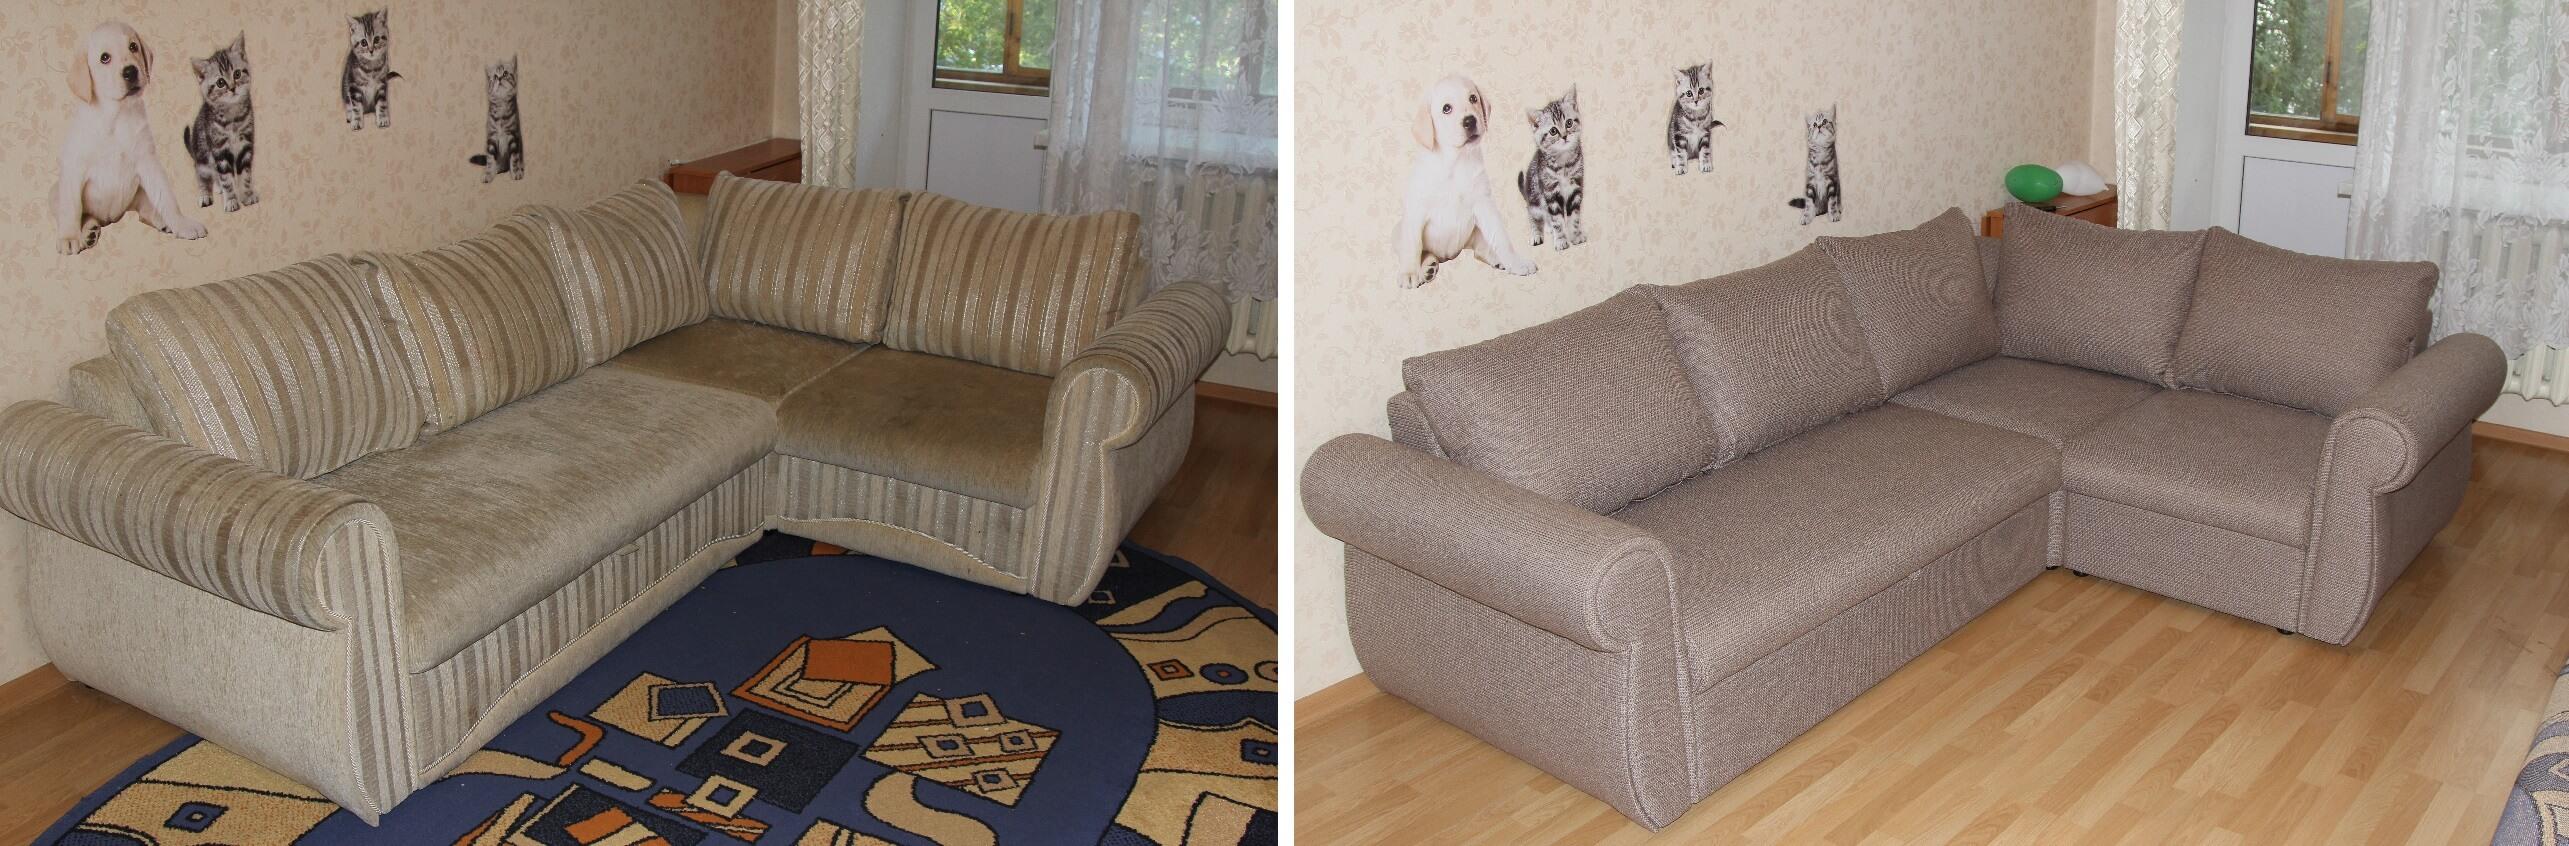 Мебель до и после ремонта  - фото 23